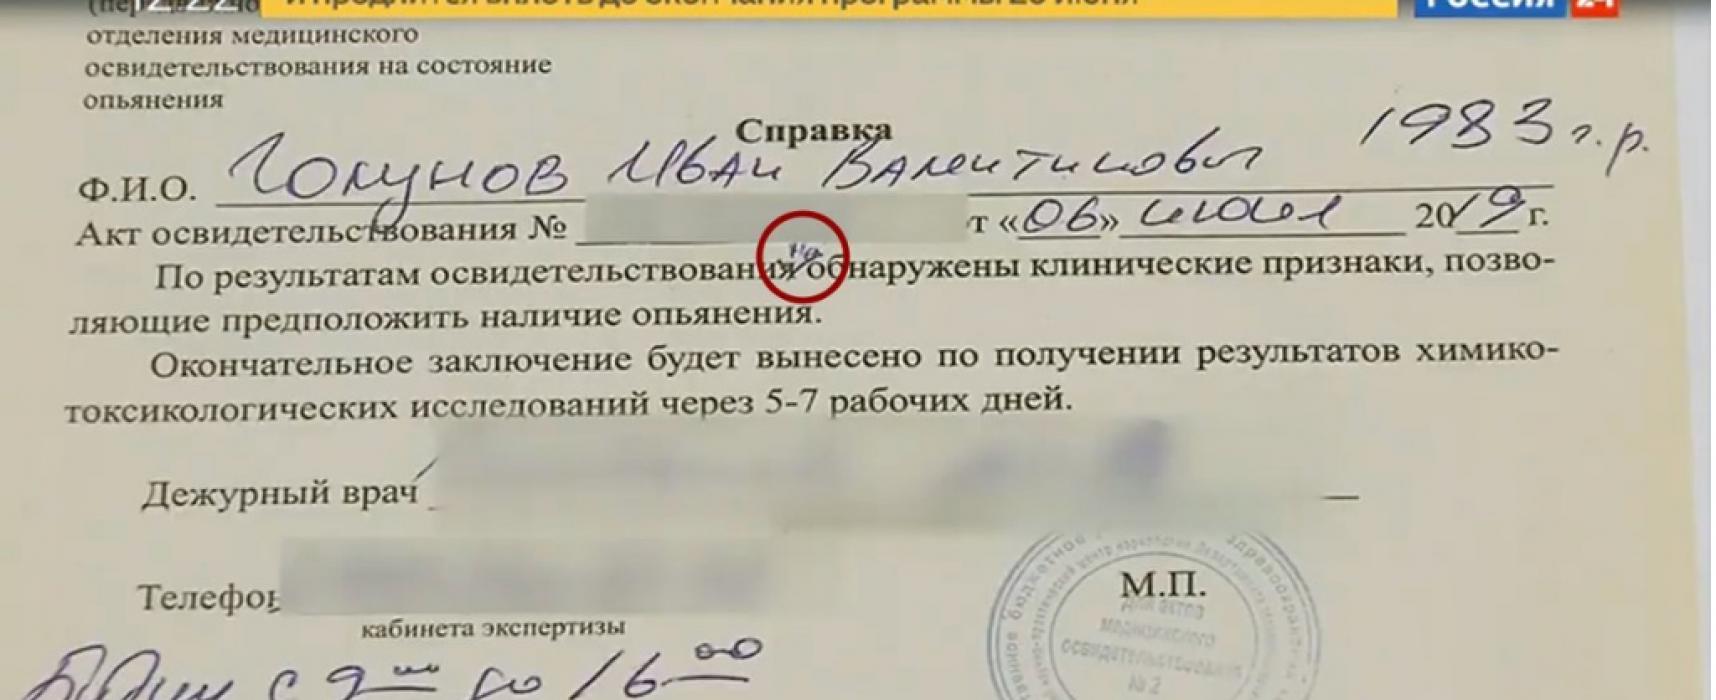 Russian independent journalism under disinformation attack